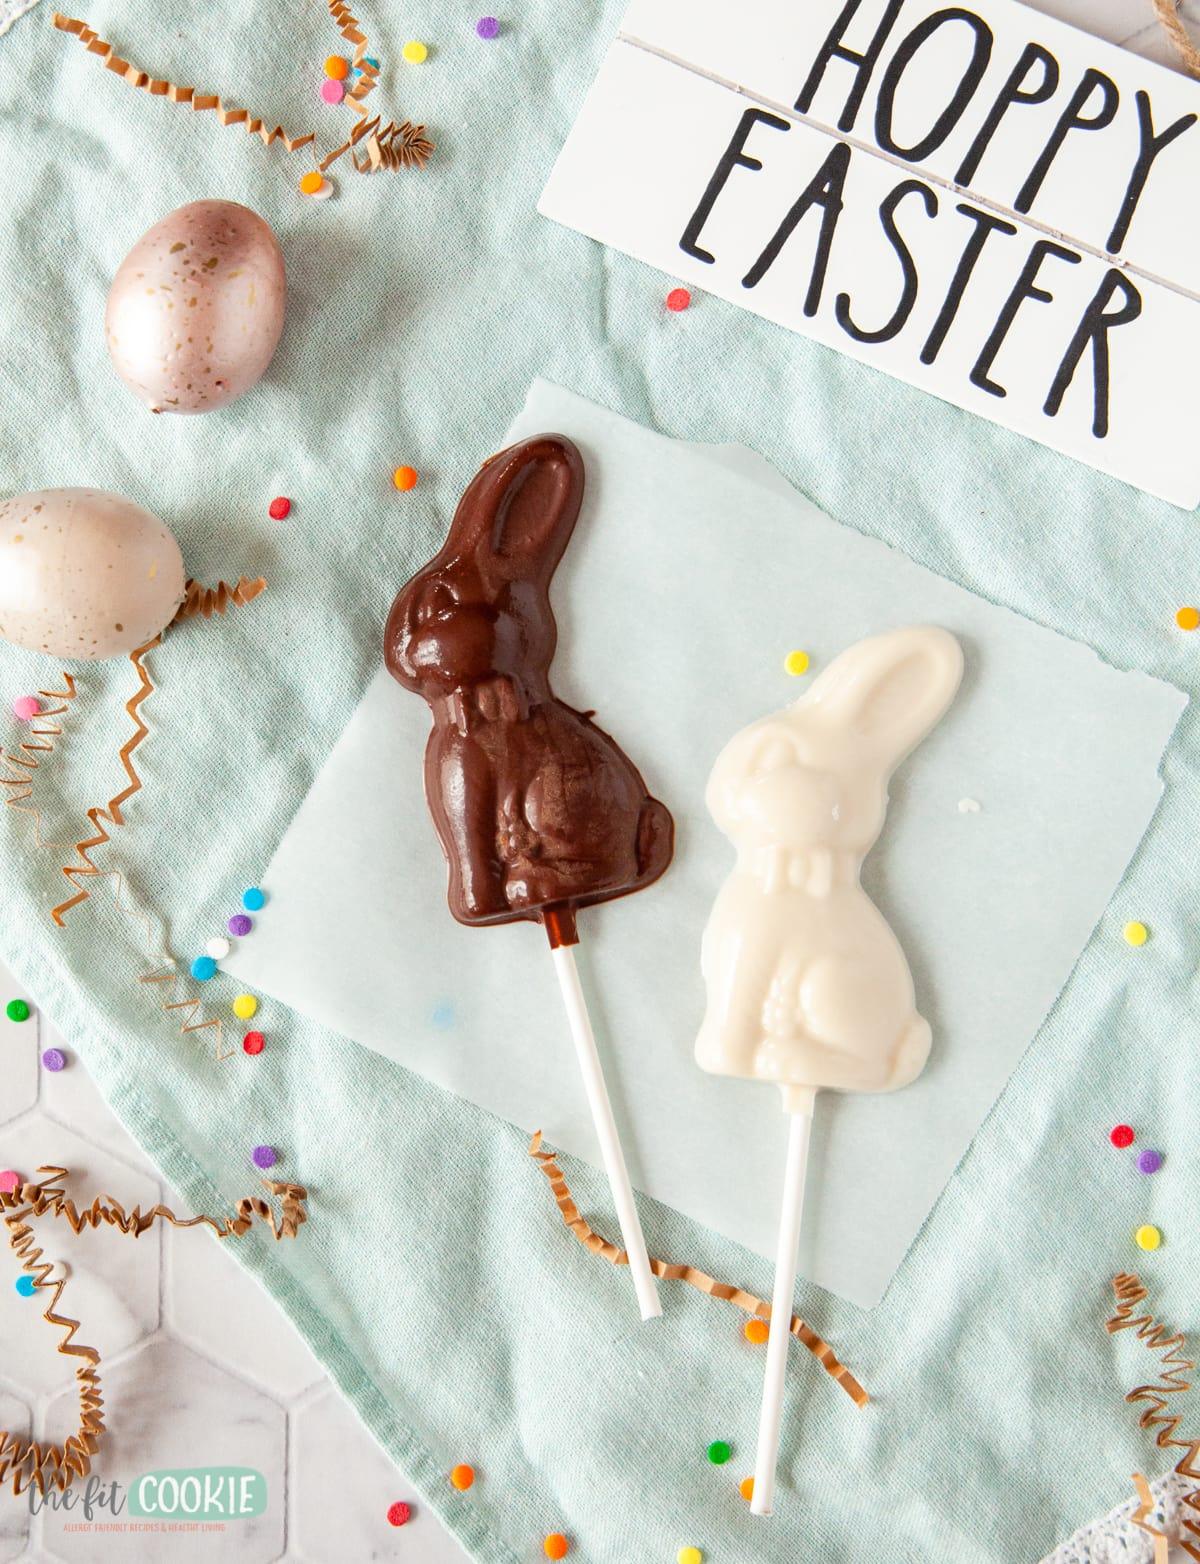 chocolate easter bunny lollipops ona  blue napkin